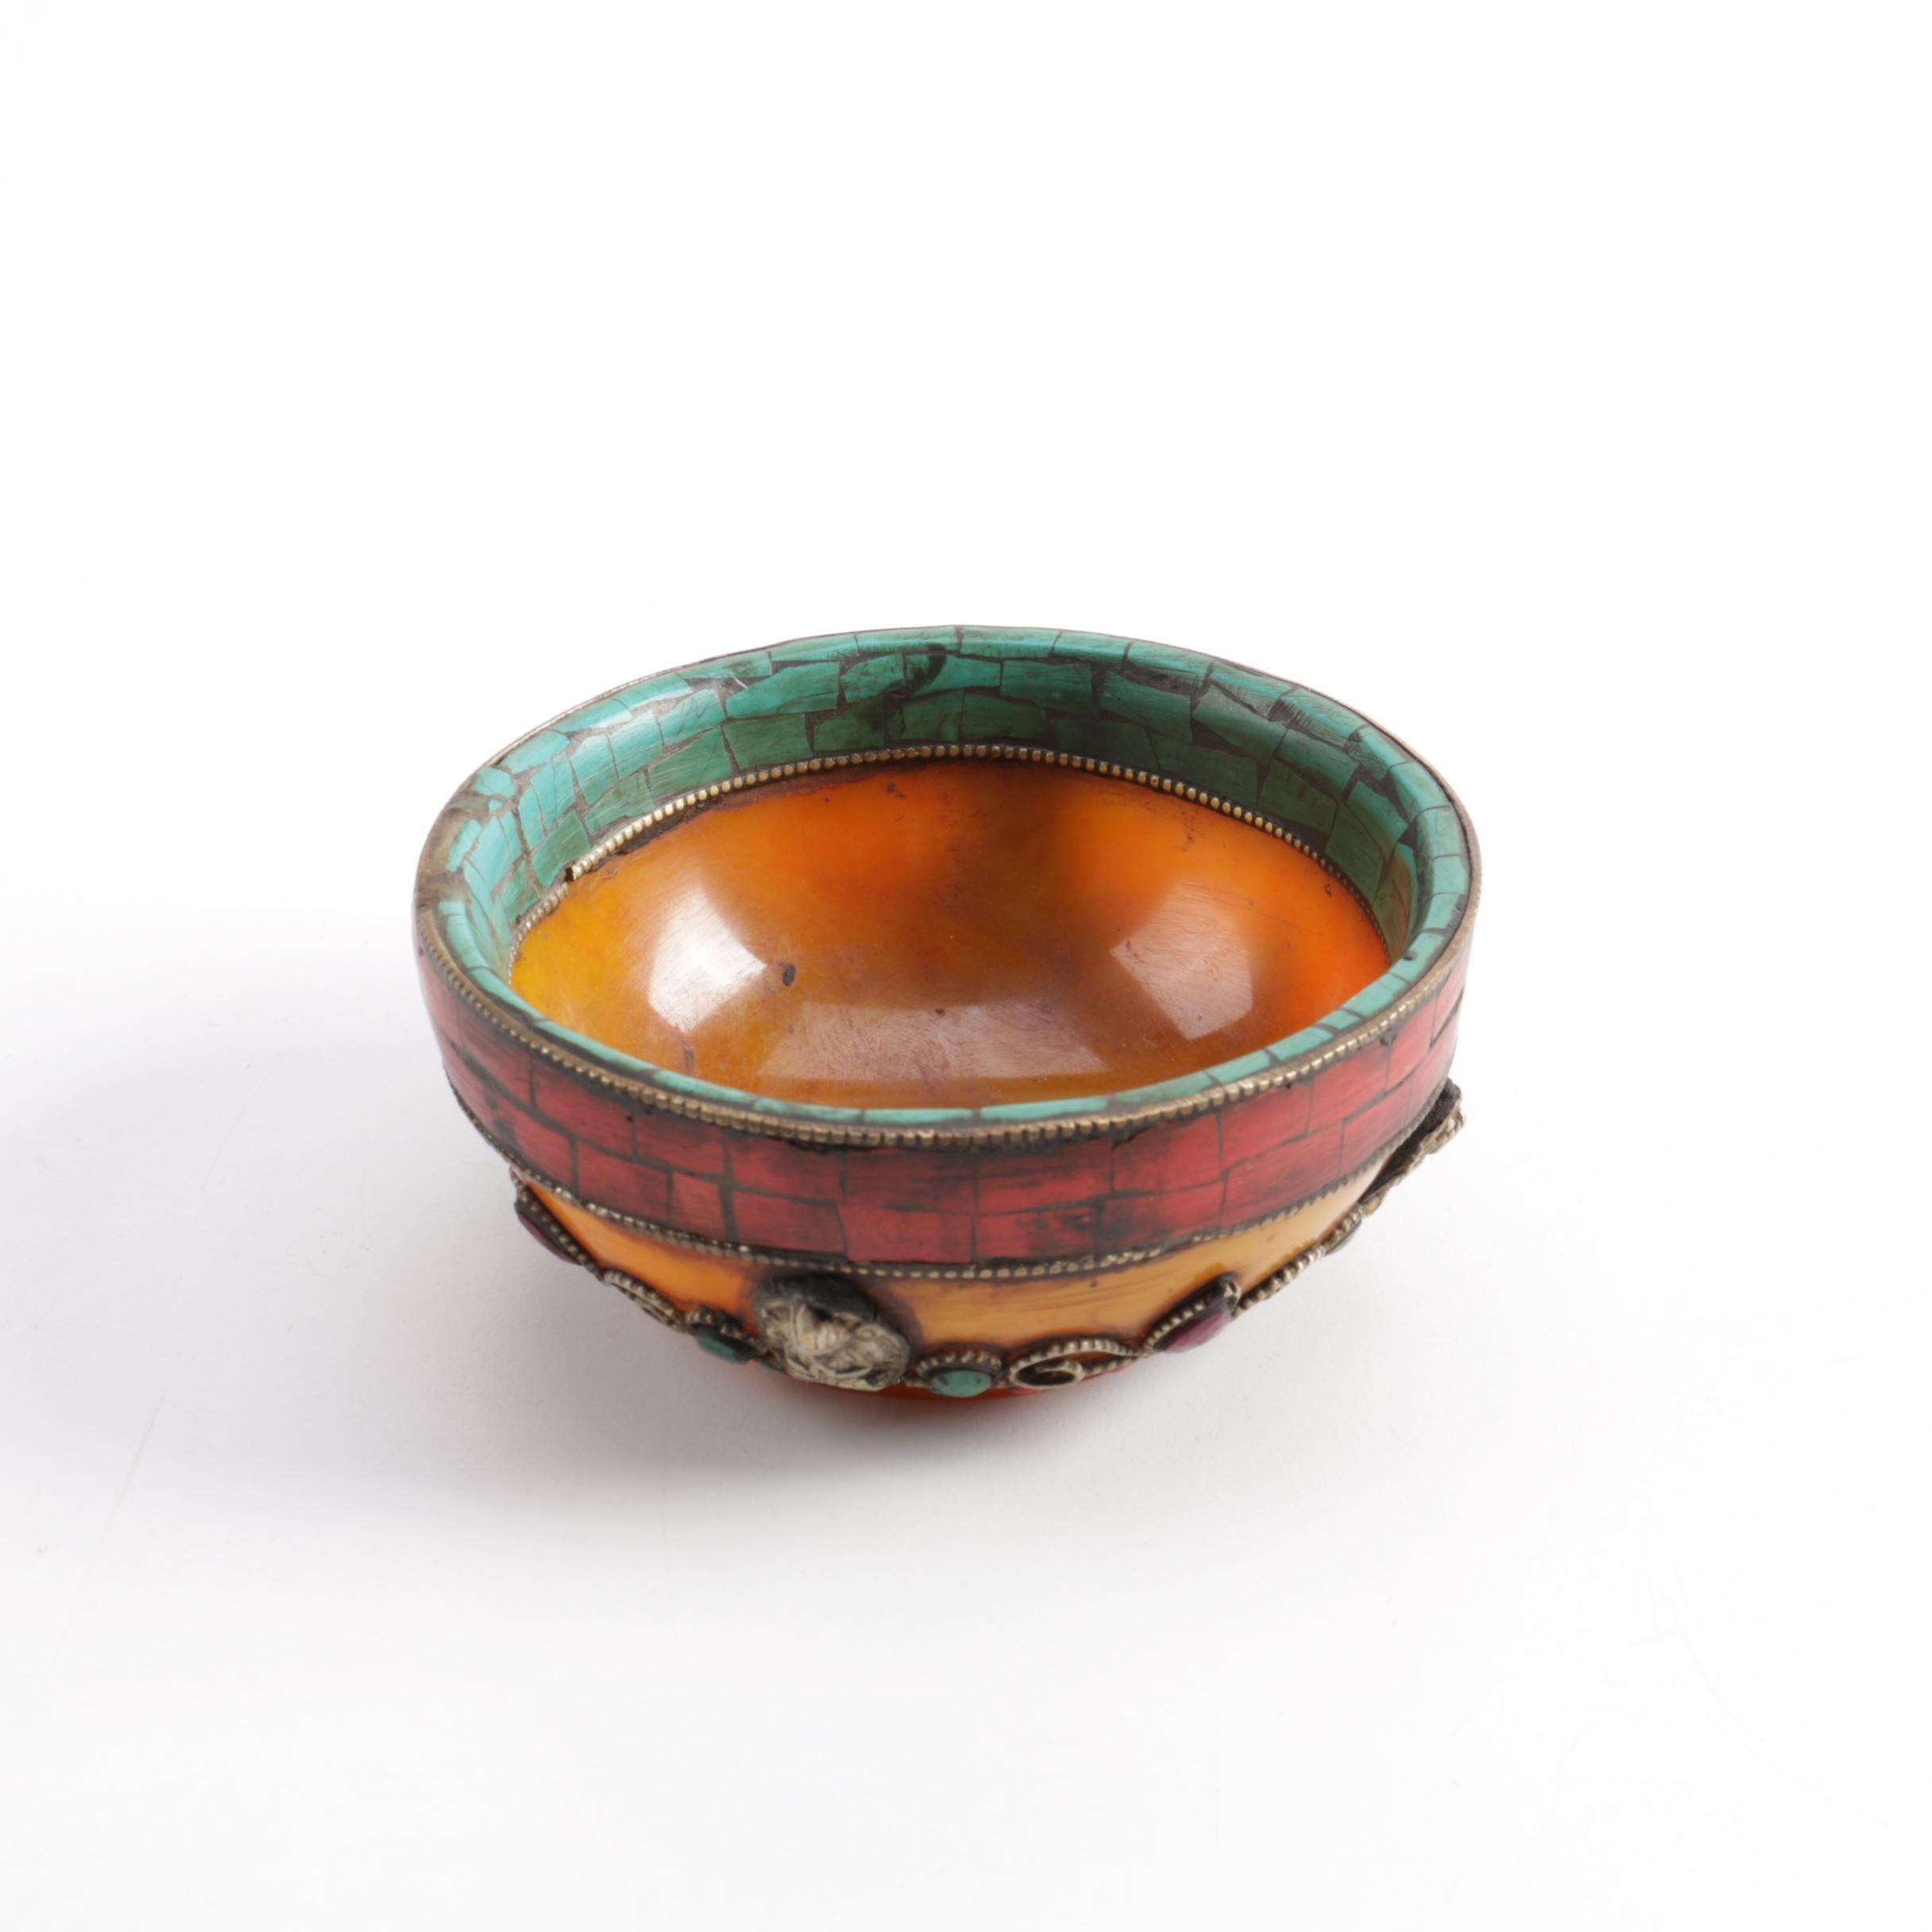 Tibetan Style Dyed Quartz, Howlite and Resin Mosaic Bowl